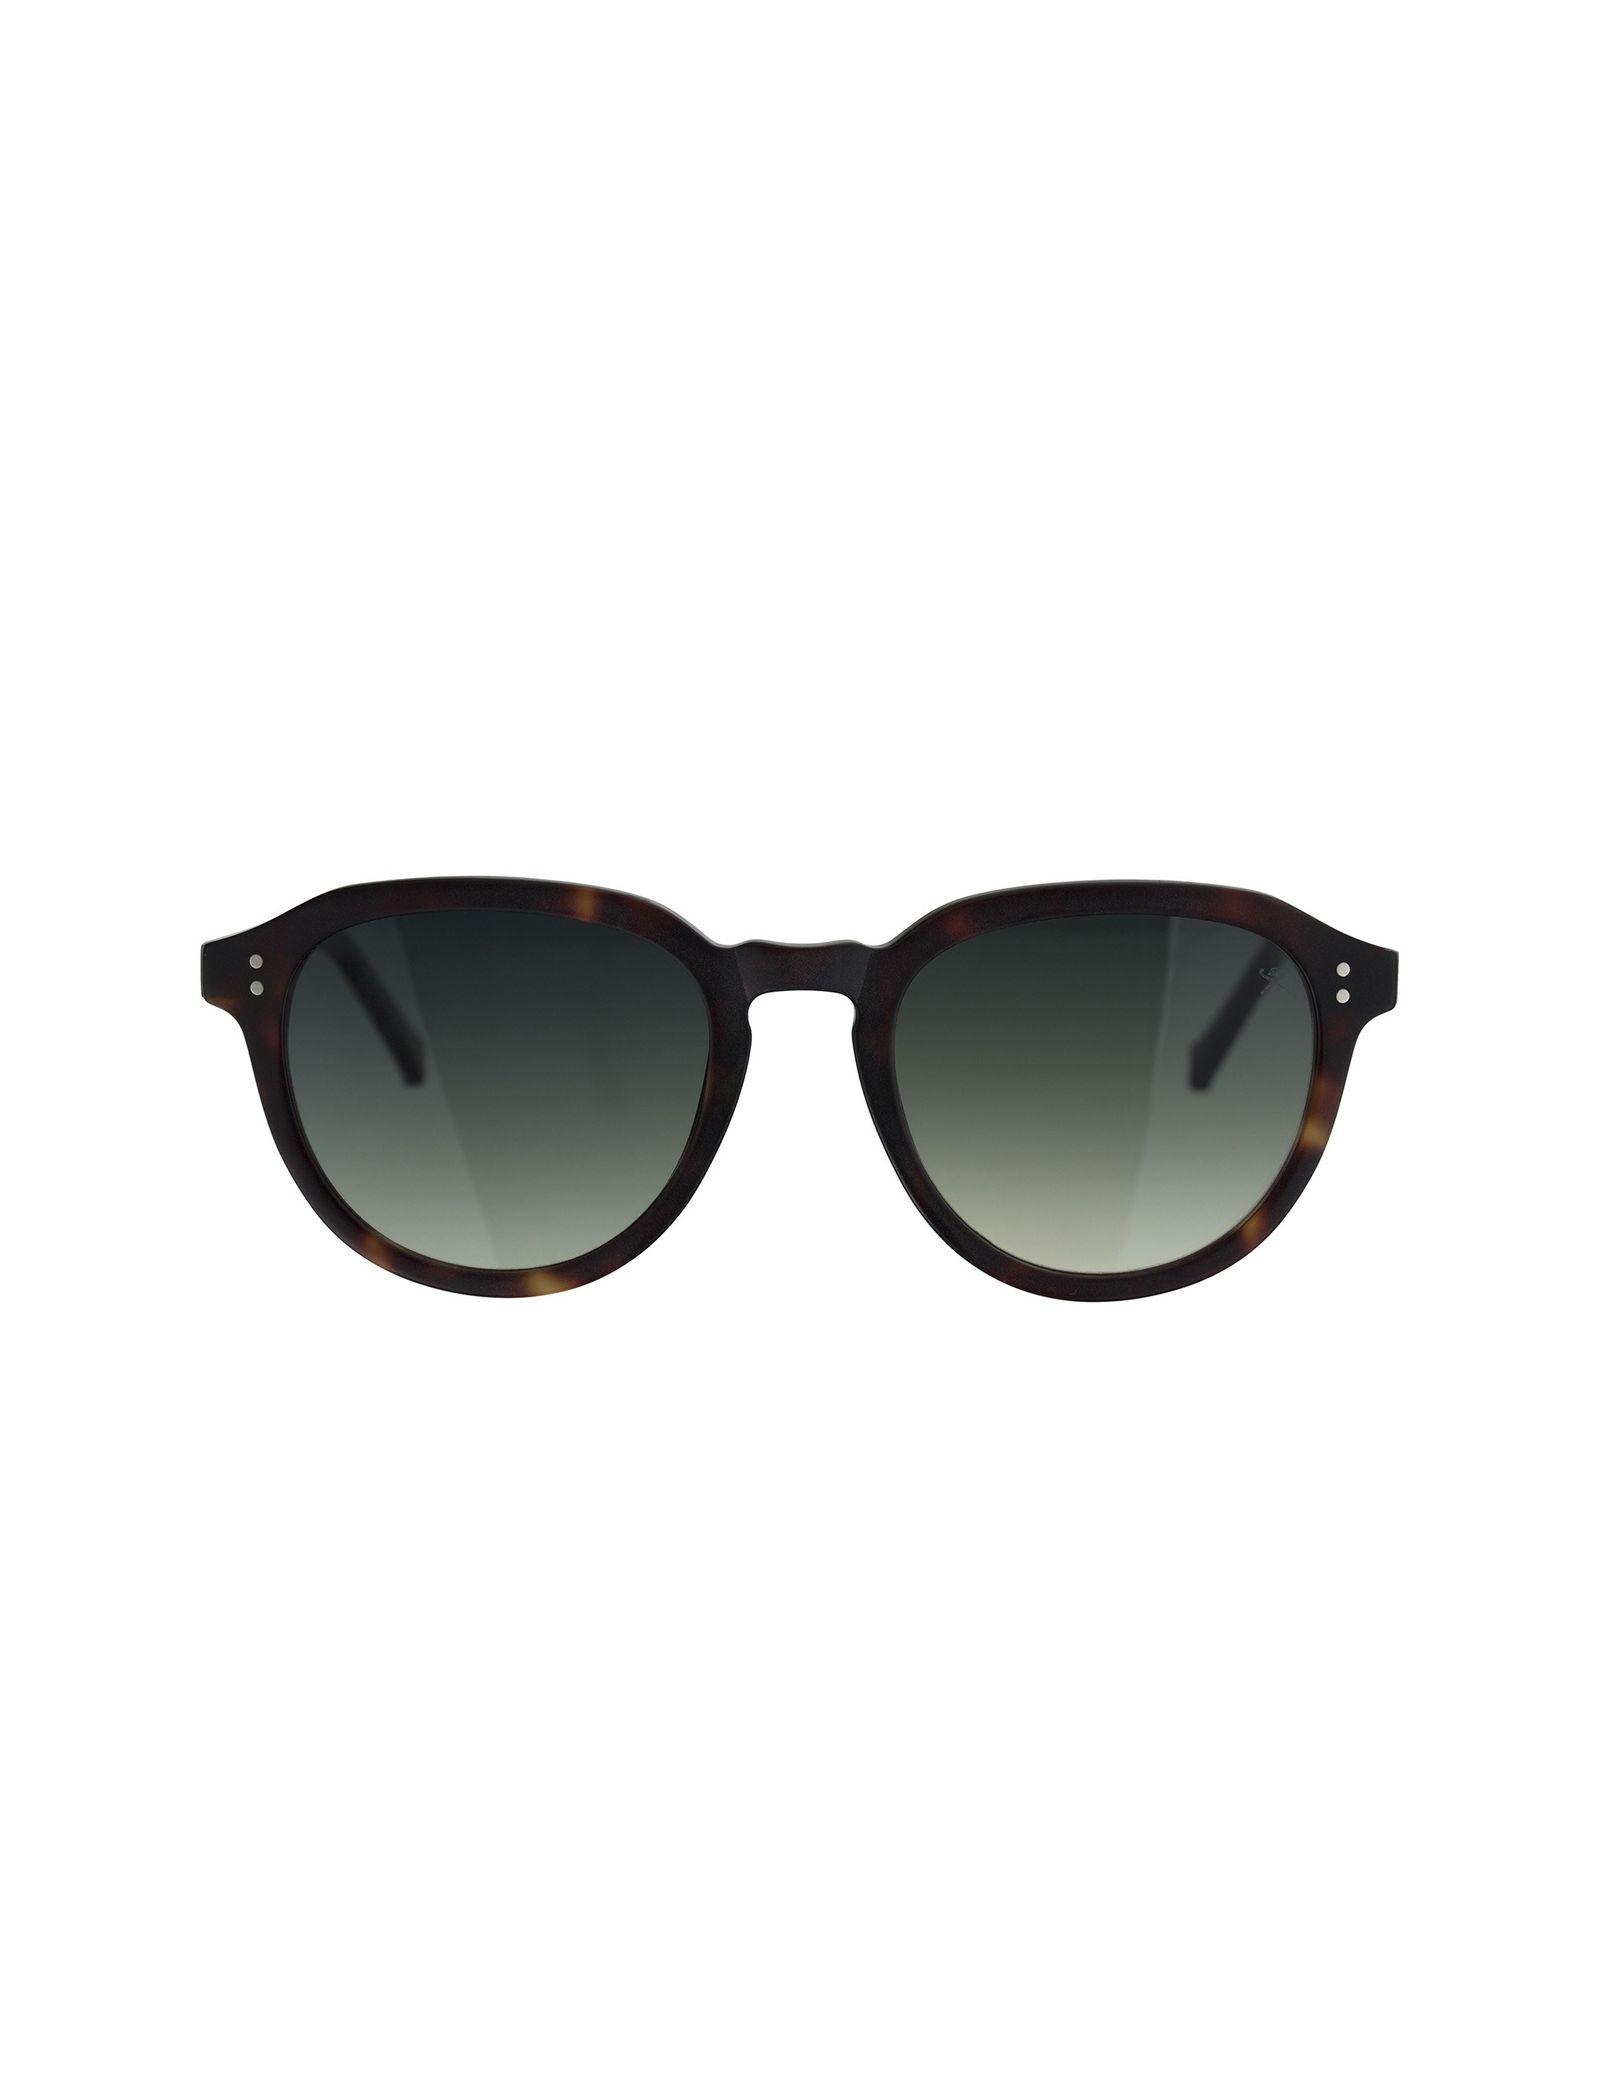 عینک آفتابی پنتوس زنانه - هکت - قهوه اي    - 1